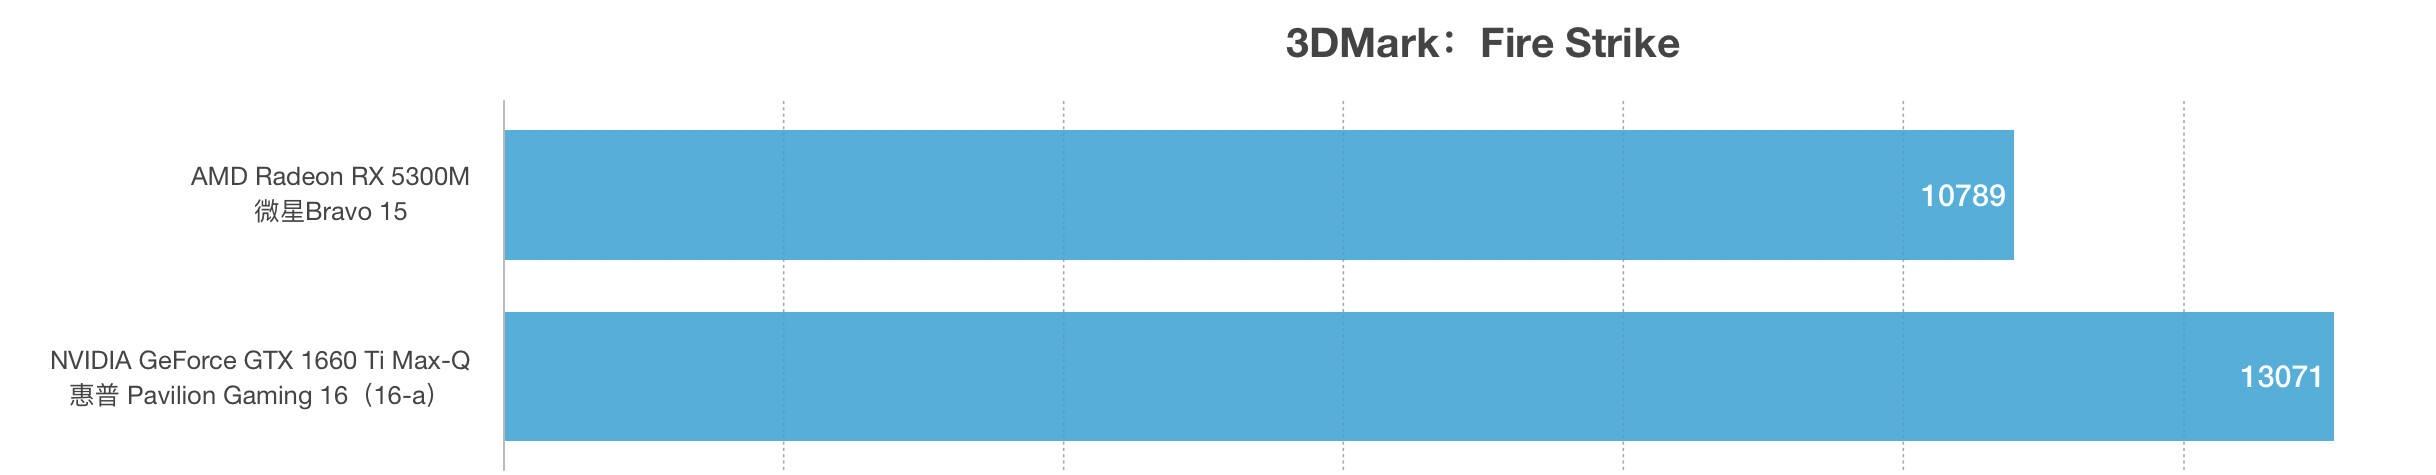 AMD Radeon RX 5300M和GTX 1660 Ti Max-Q性能跑分对比评测